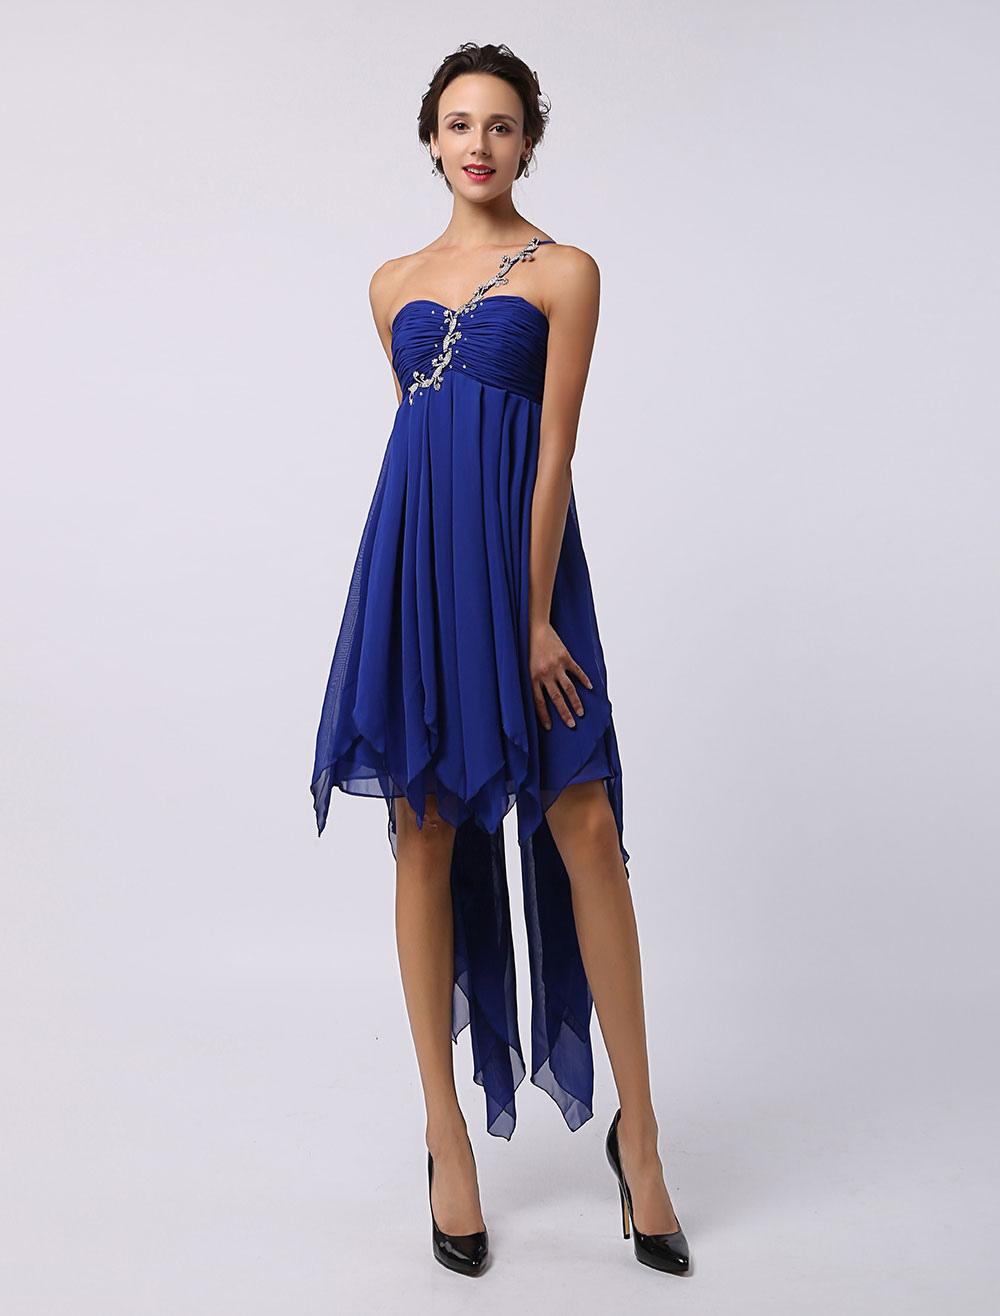 f041799e37cb Blue Prom Dress 2019 Short Chiffon Beading Homecoming Dress Royal ...